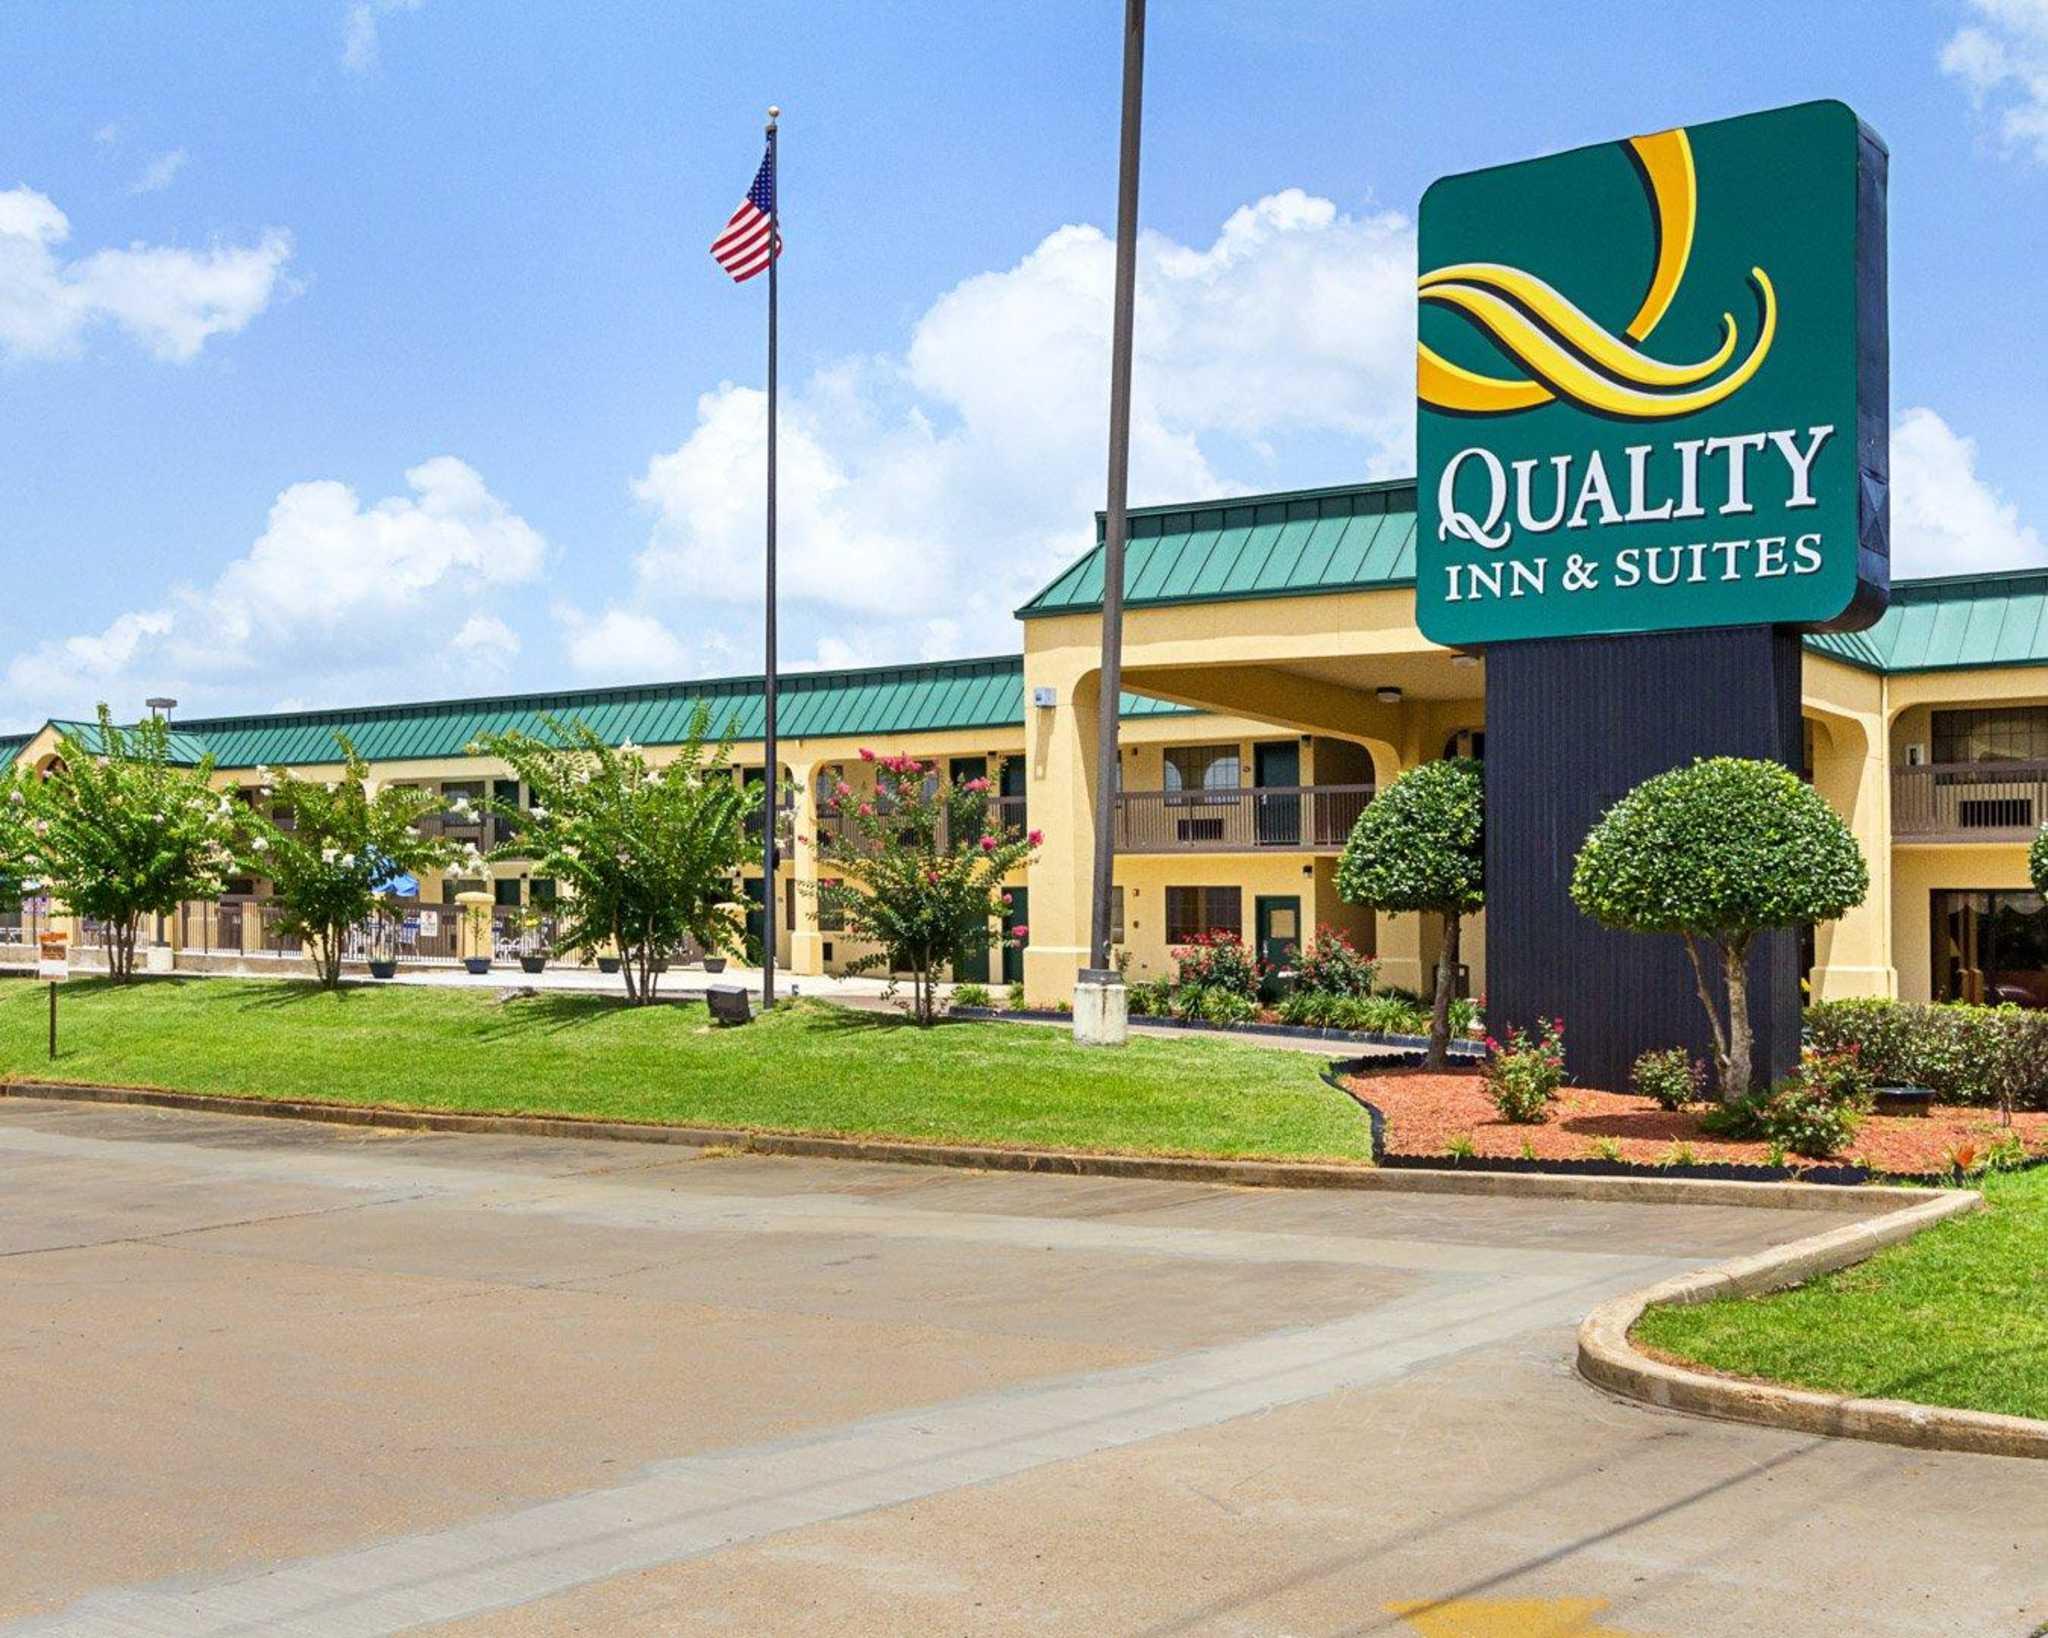 Quality Inn & Suites Southwest image 0